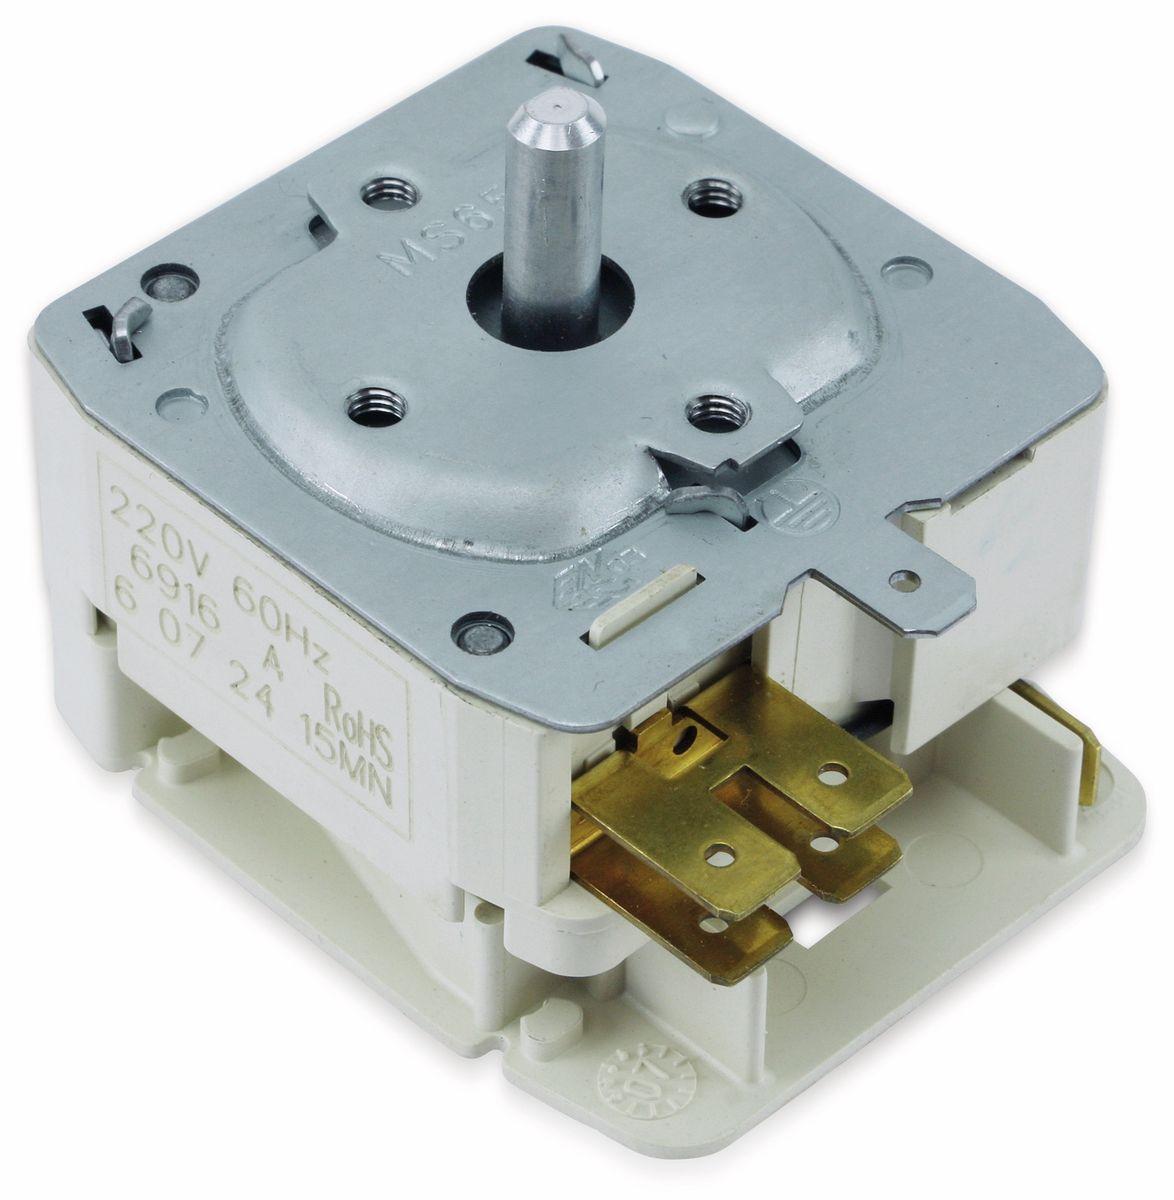 Elektrisches Timer-Schaltwerk INVENSYS MS65, 220 V, 16 A/230 V~, 15 ...